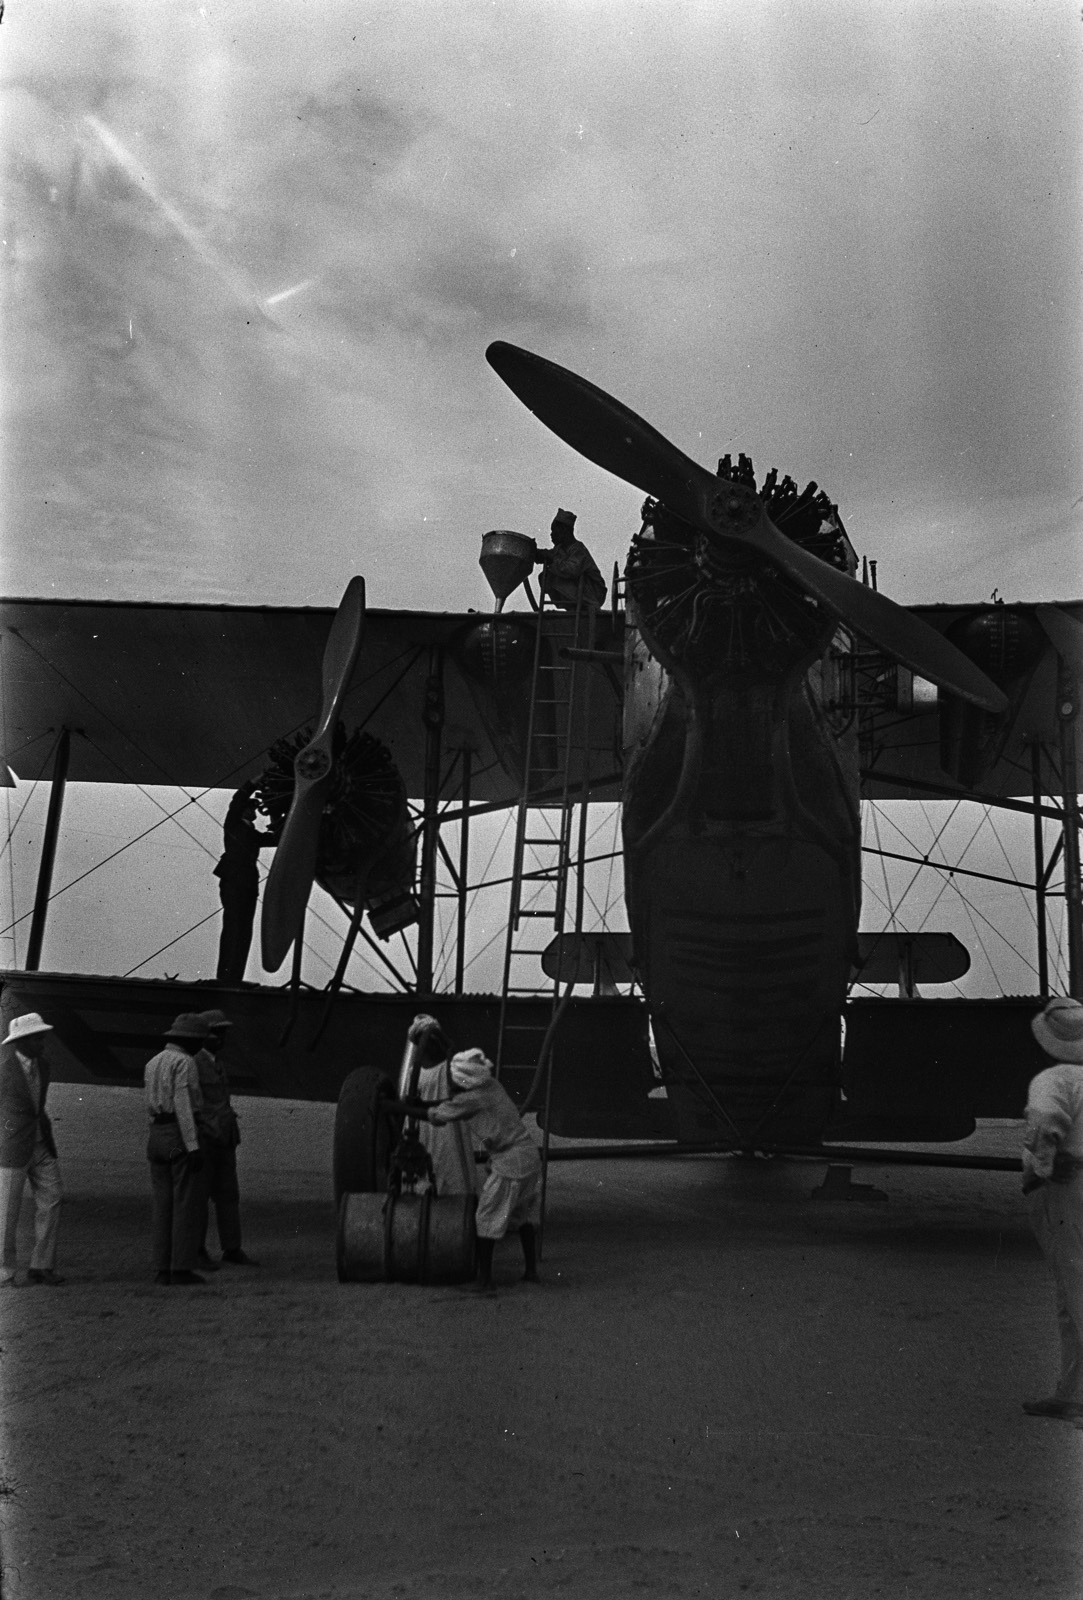 Судан. Вади-Халфа. Заправка английский авиалайнера